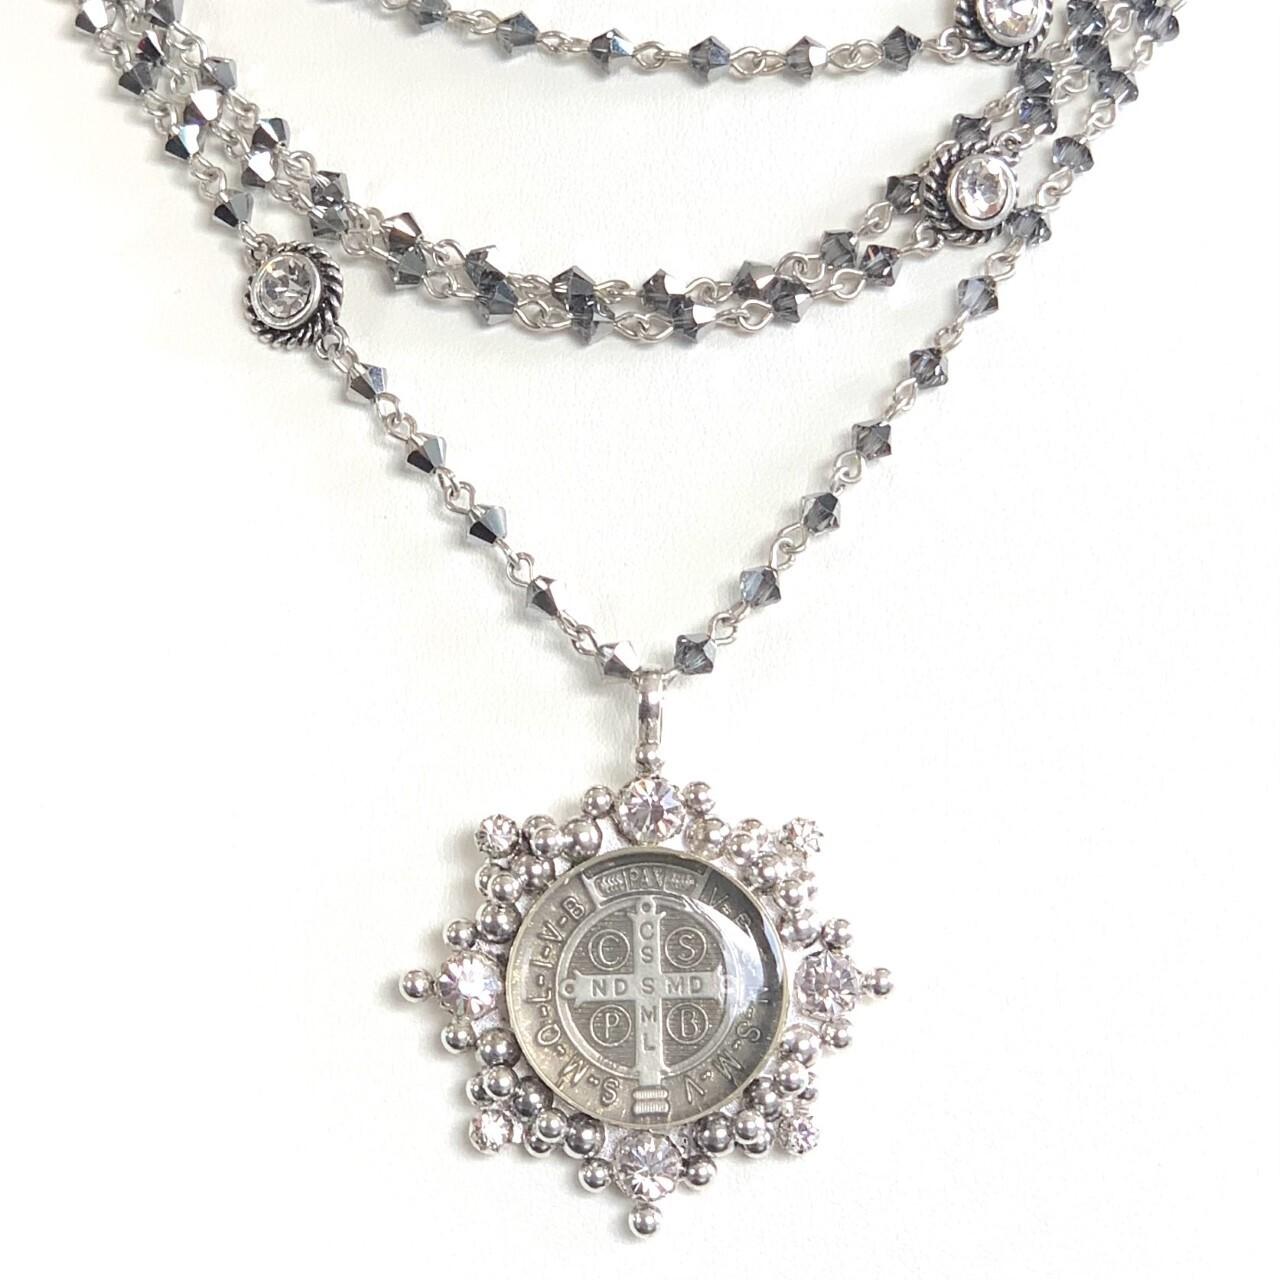 VSA Magdalena Necklace in Chrome (Silver)